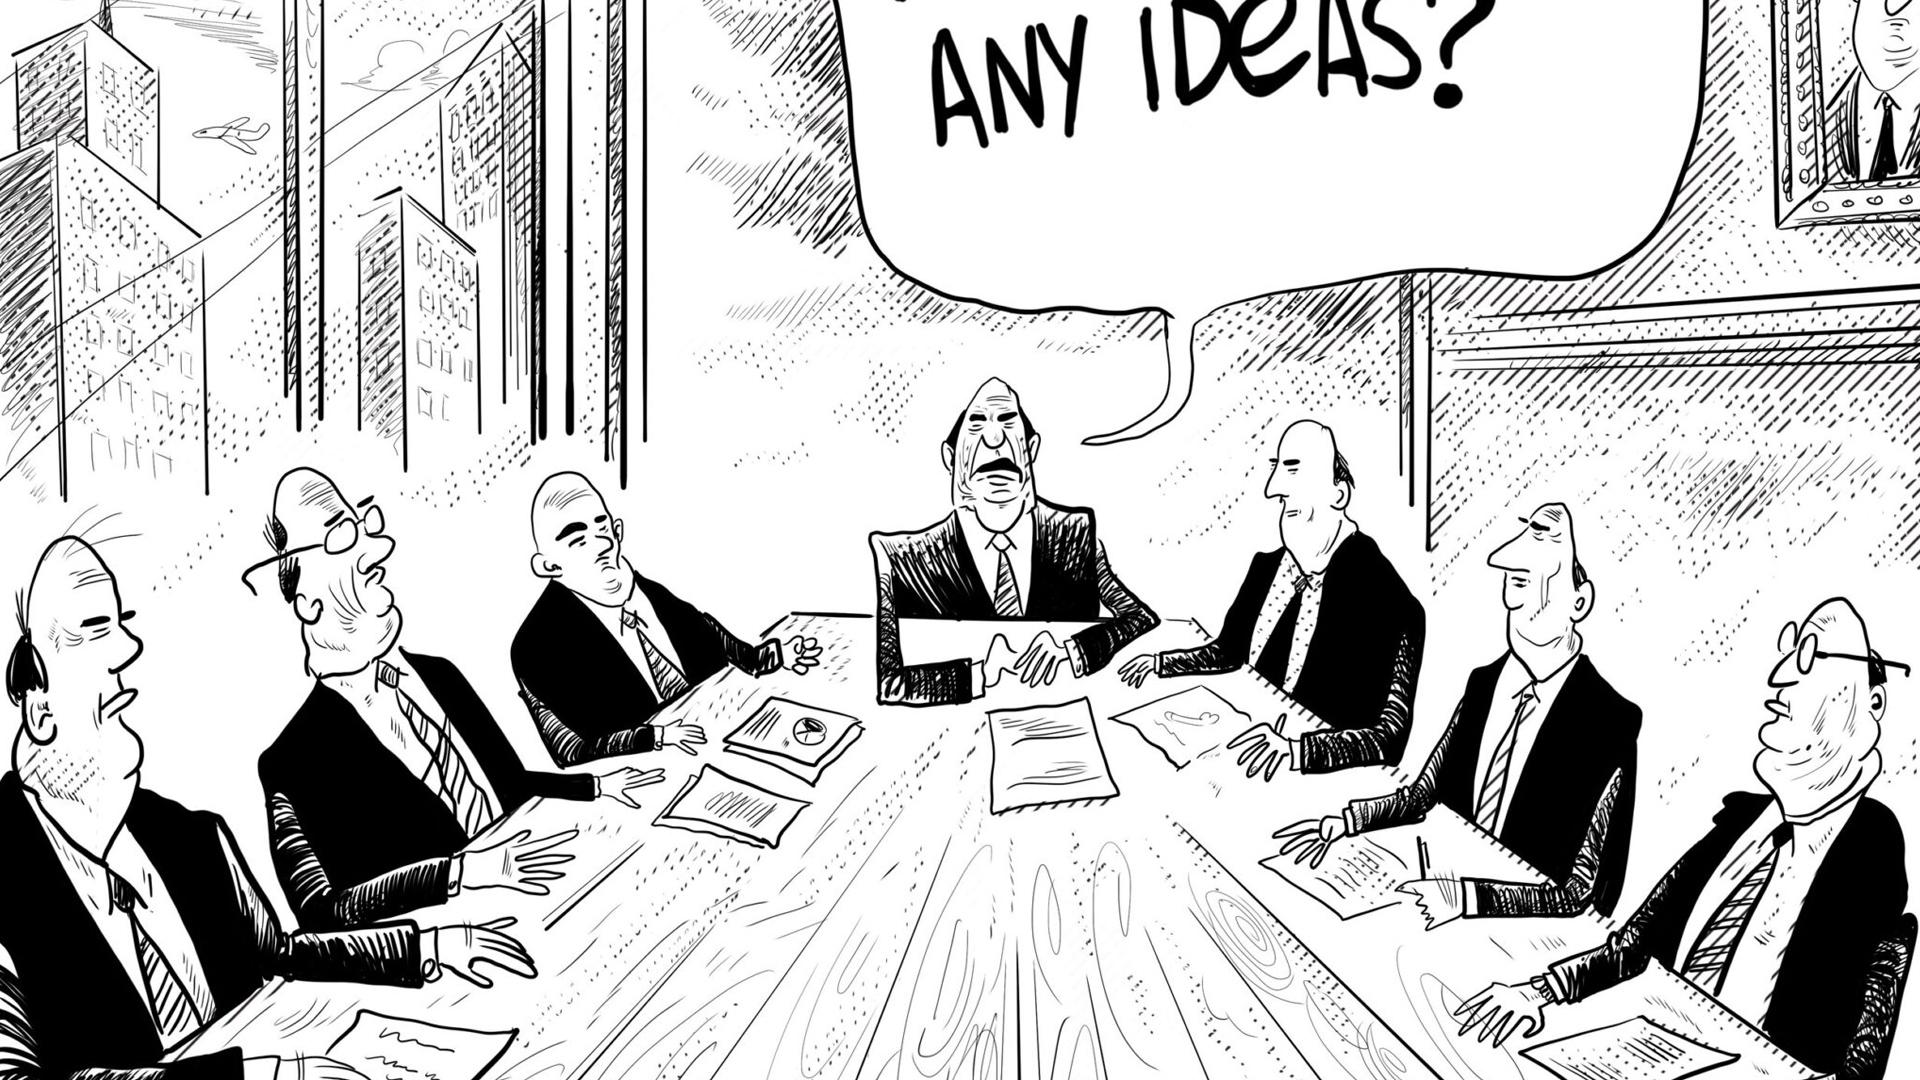 Politics of advertising